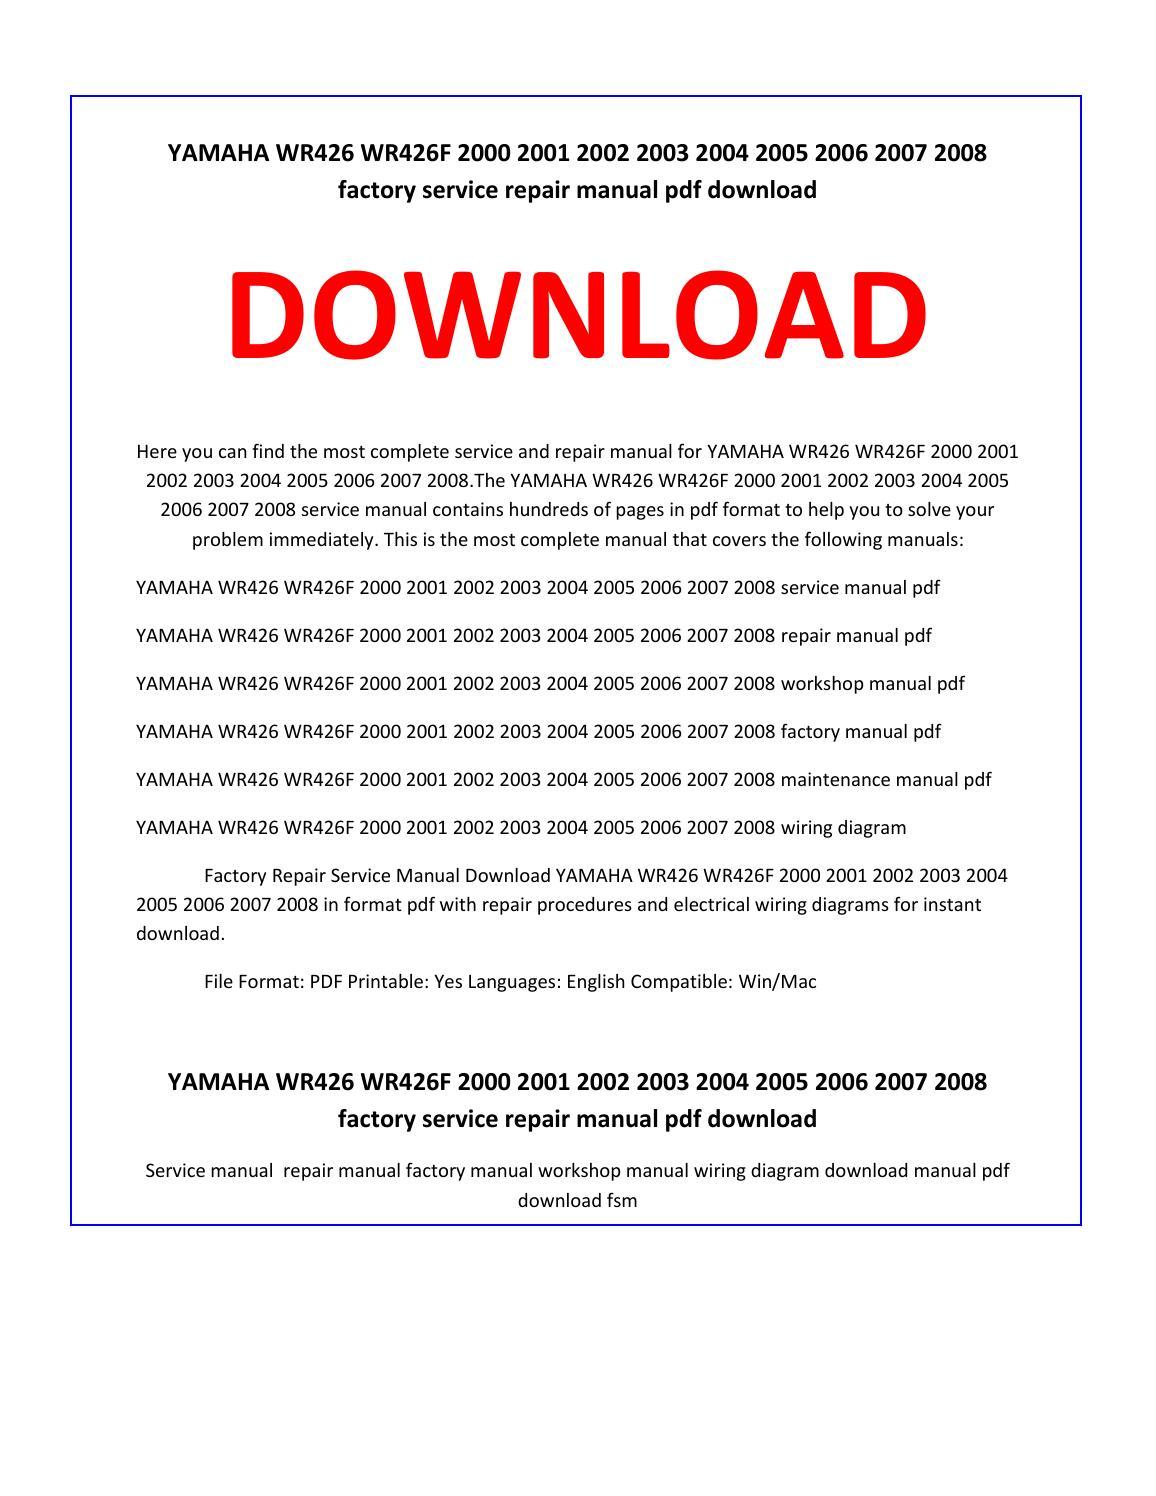 1998 1999 club car tourall resort villager trans porter trans sender electric vehicle repair manual download pdf